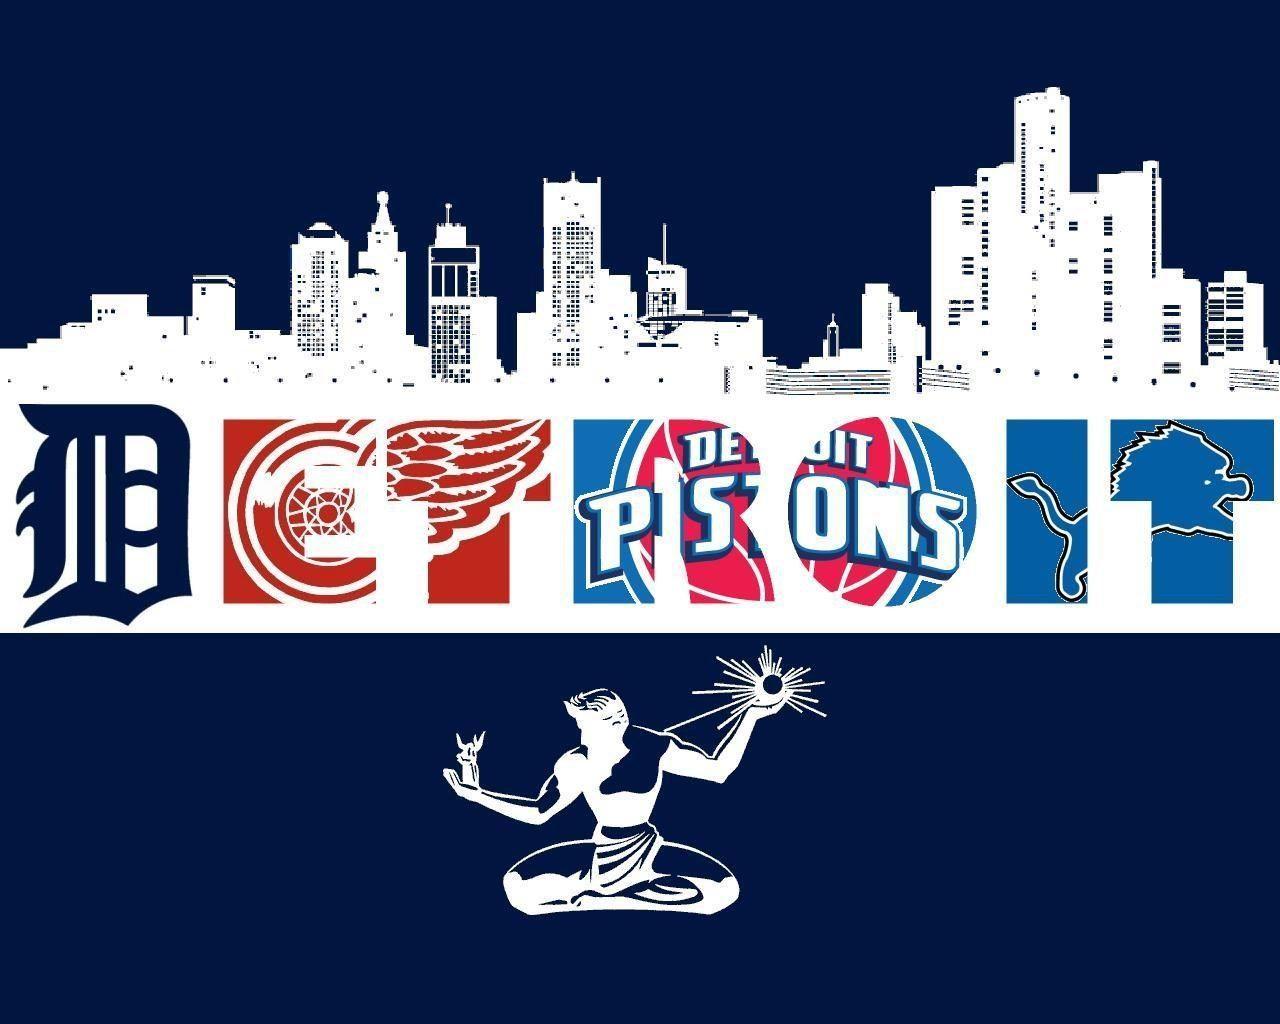 Detroit Teams Wallpapers Top Free Detroit Teams Backgrounds